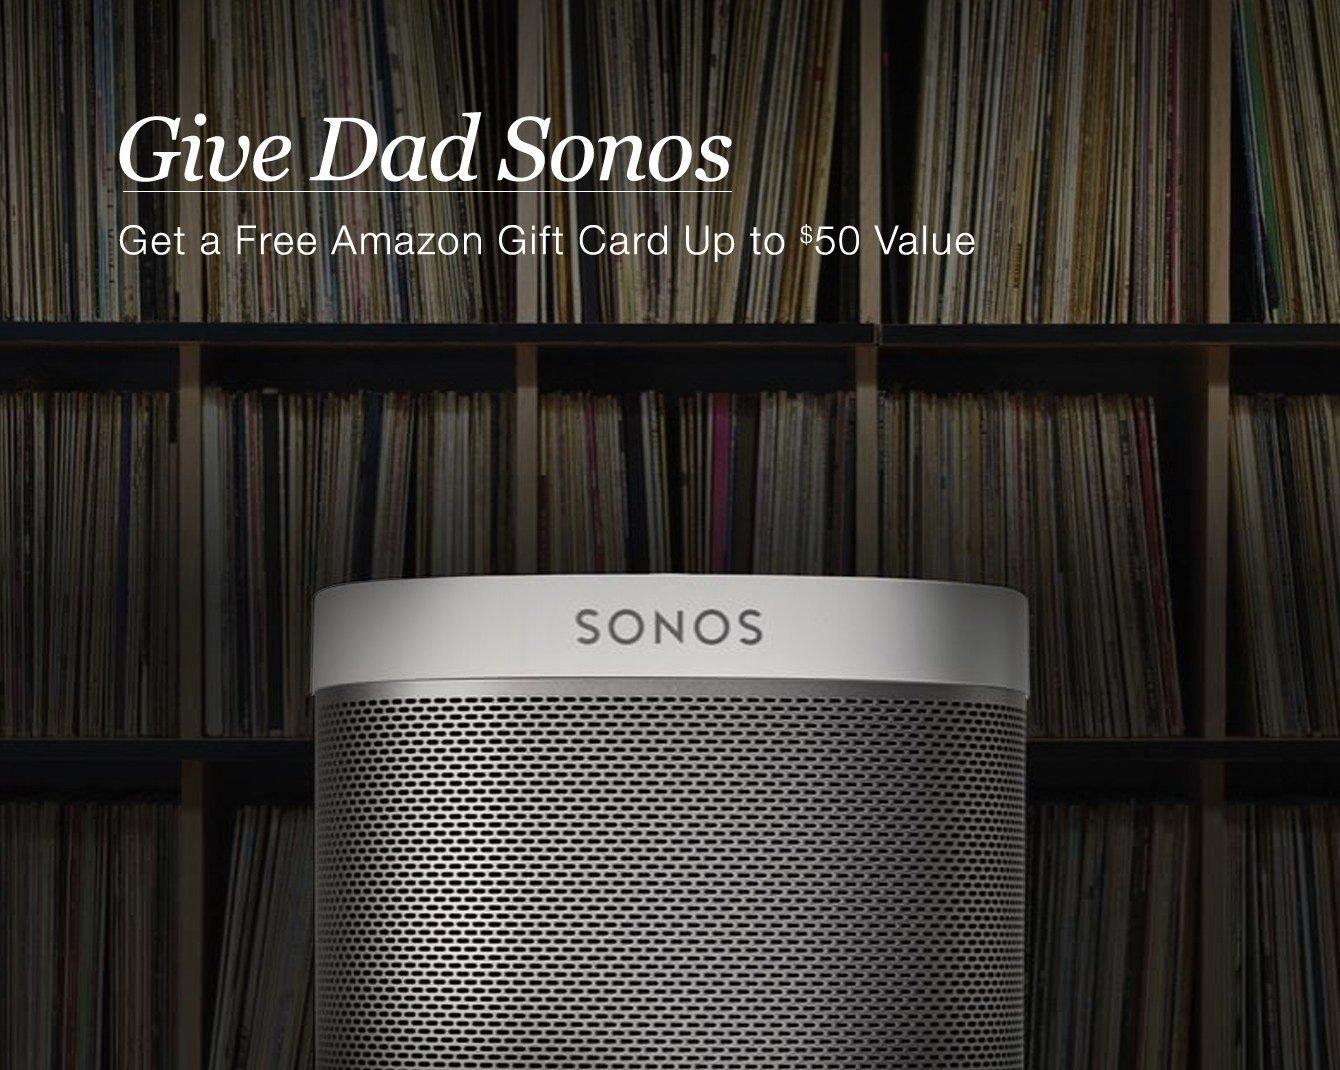 Sonos Holiday Promo $20-50 Amazon gift cards